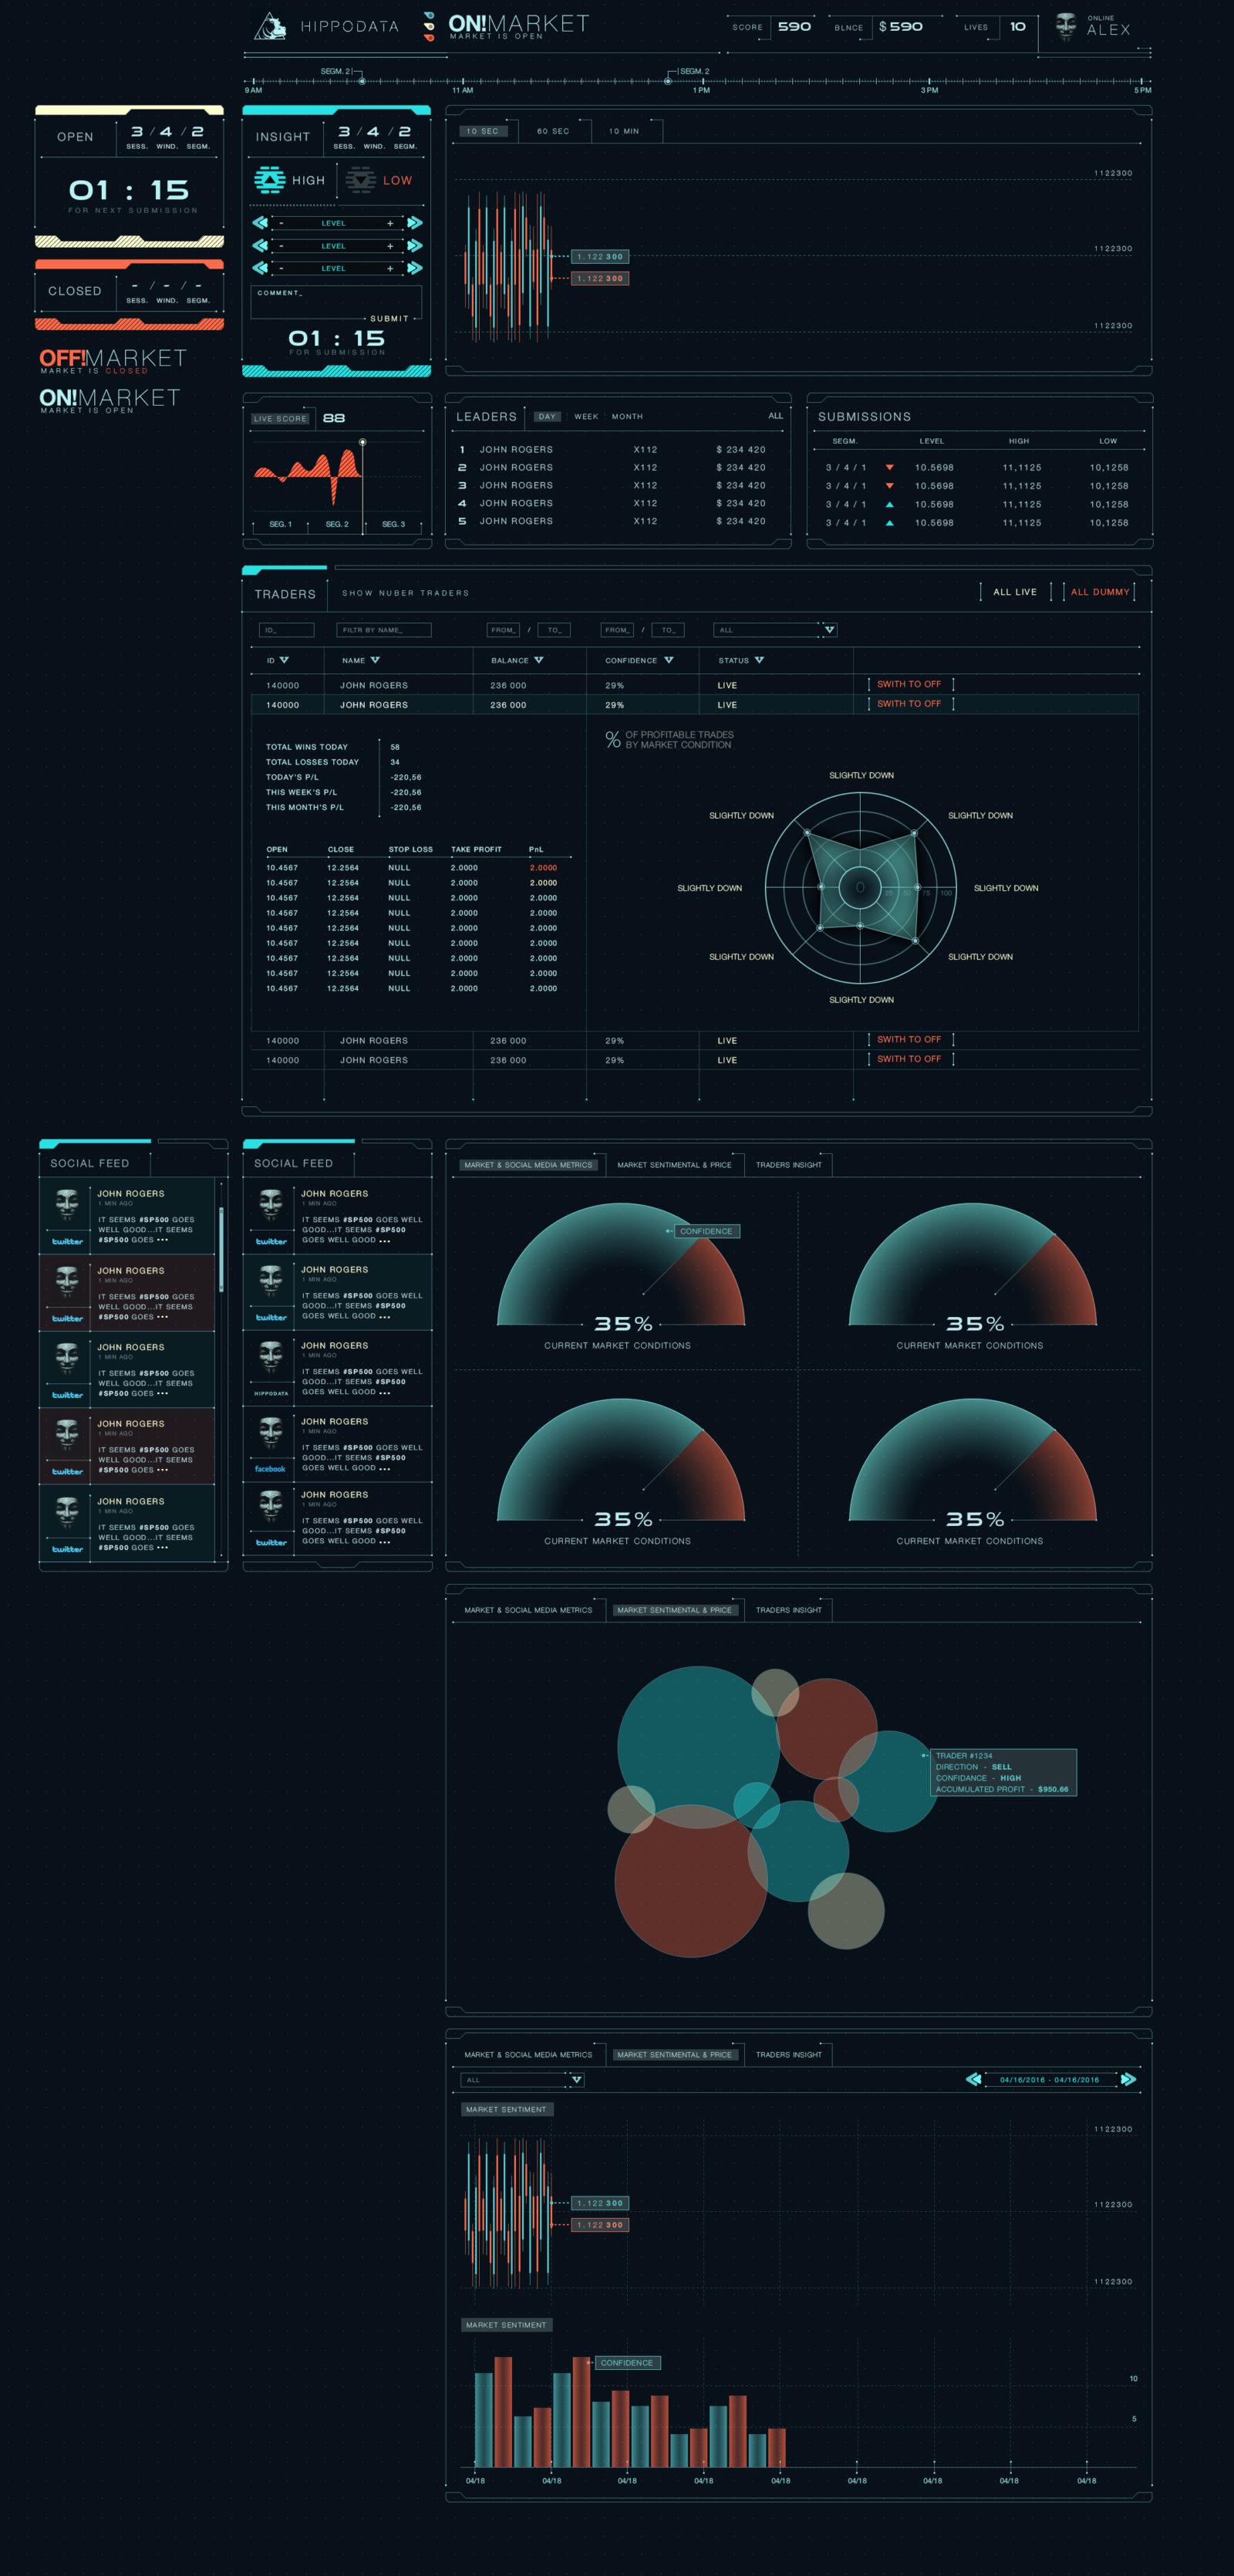 Hippo Data